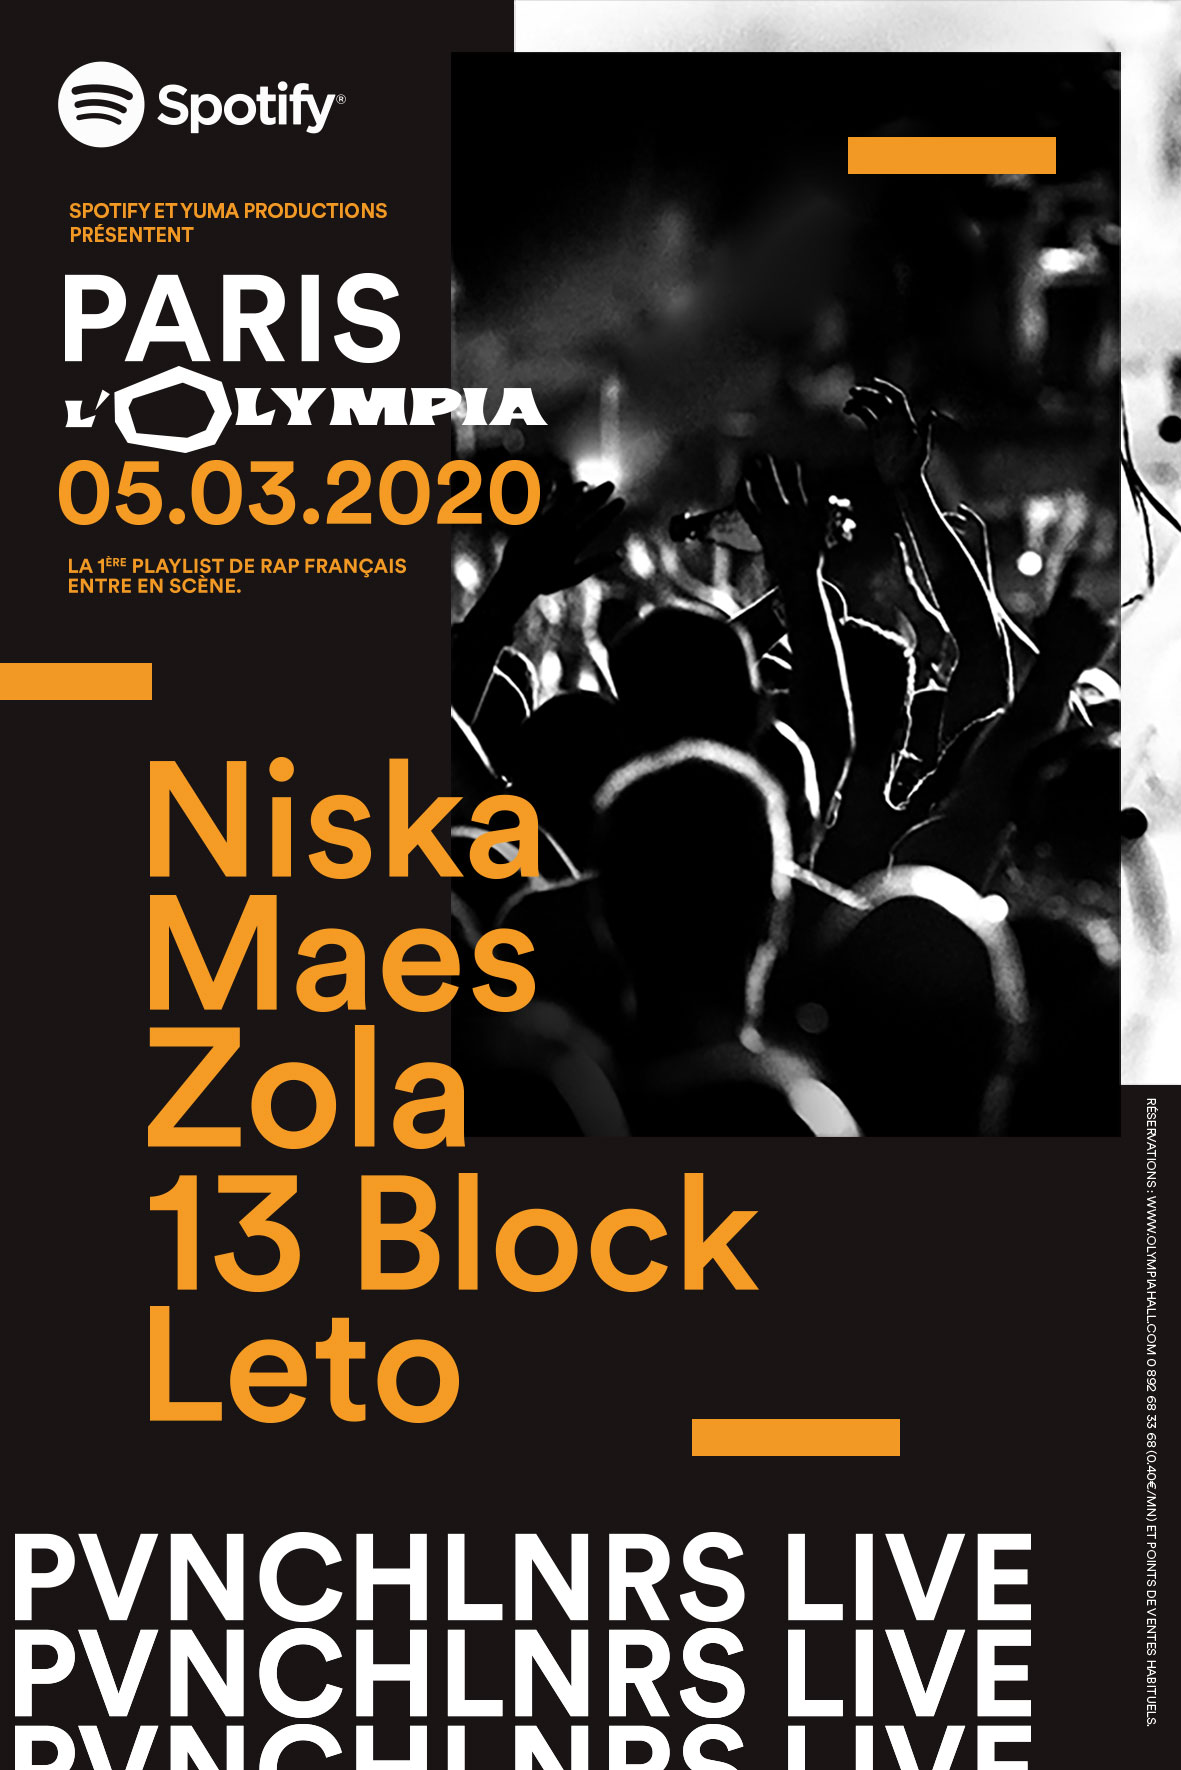 PVNCHLNRS LIVE ou la playlist rap Spotify en concert avec Zola, Niska, Maes, 13 Block, etc.